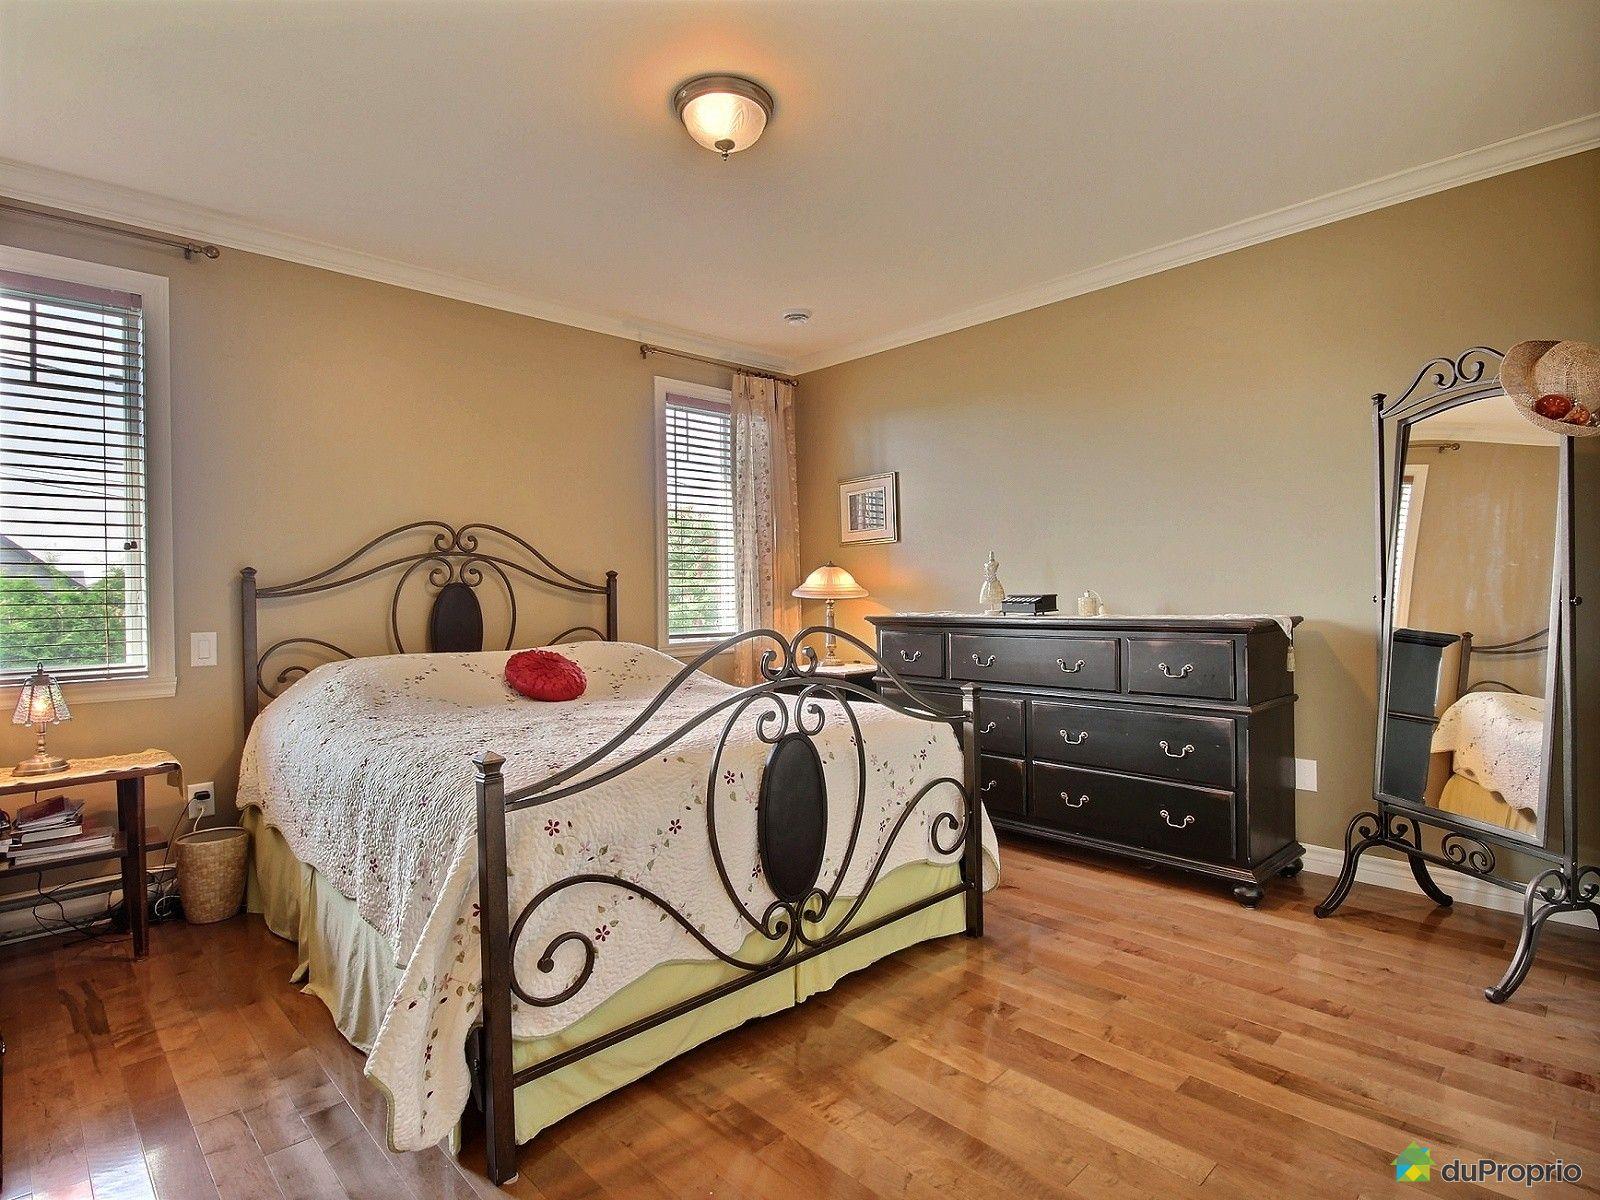 Maison vendu Sherbrooke immobilier Qubec  DuProprio  645253